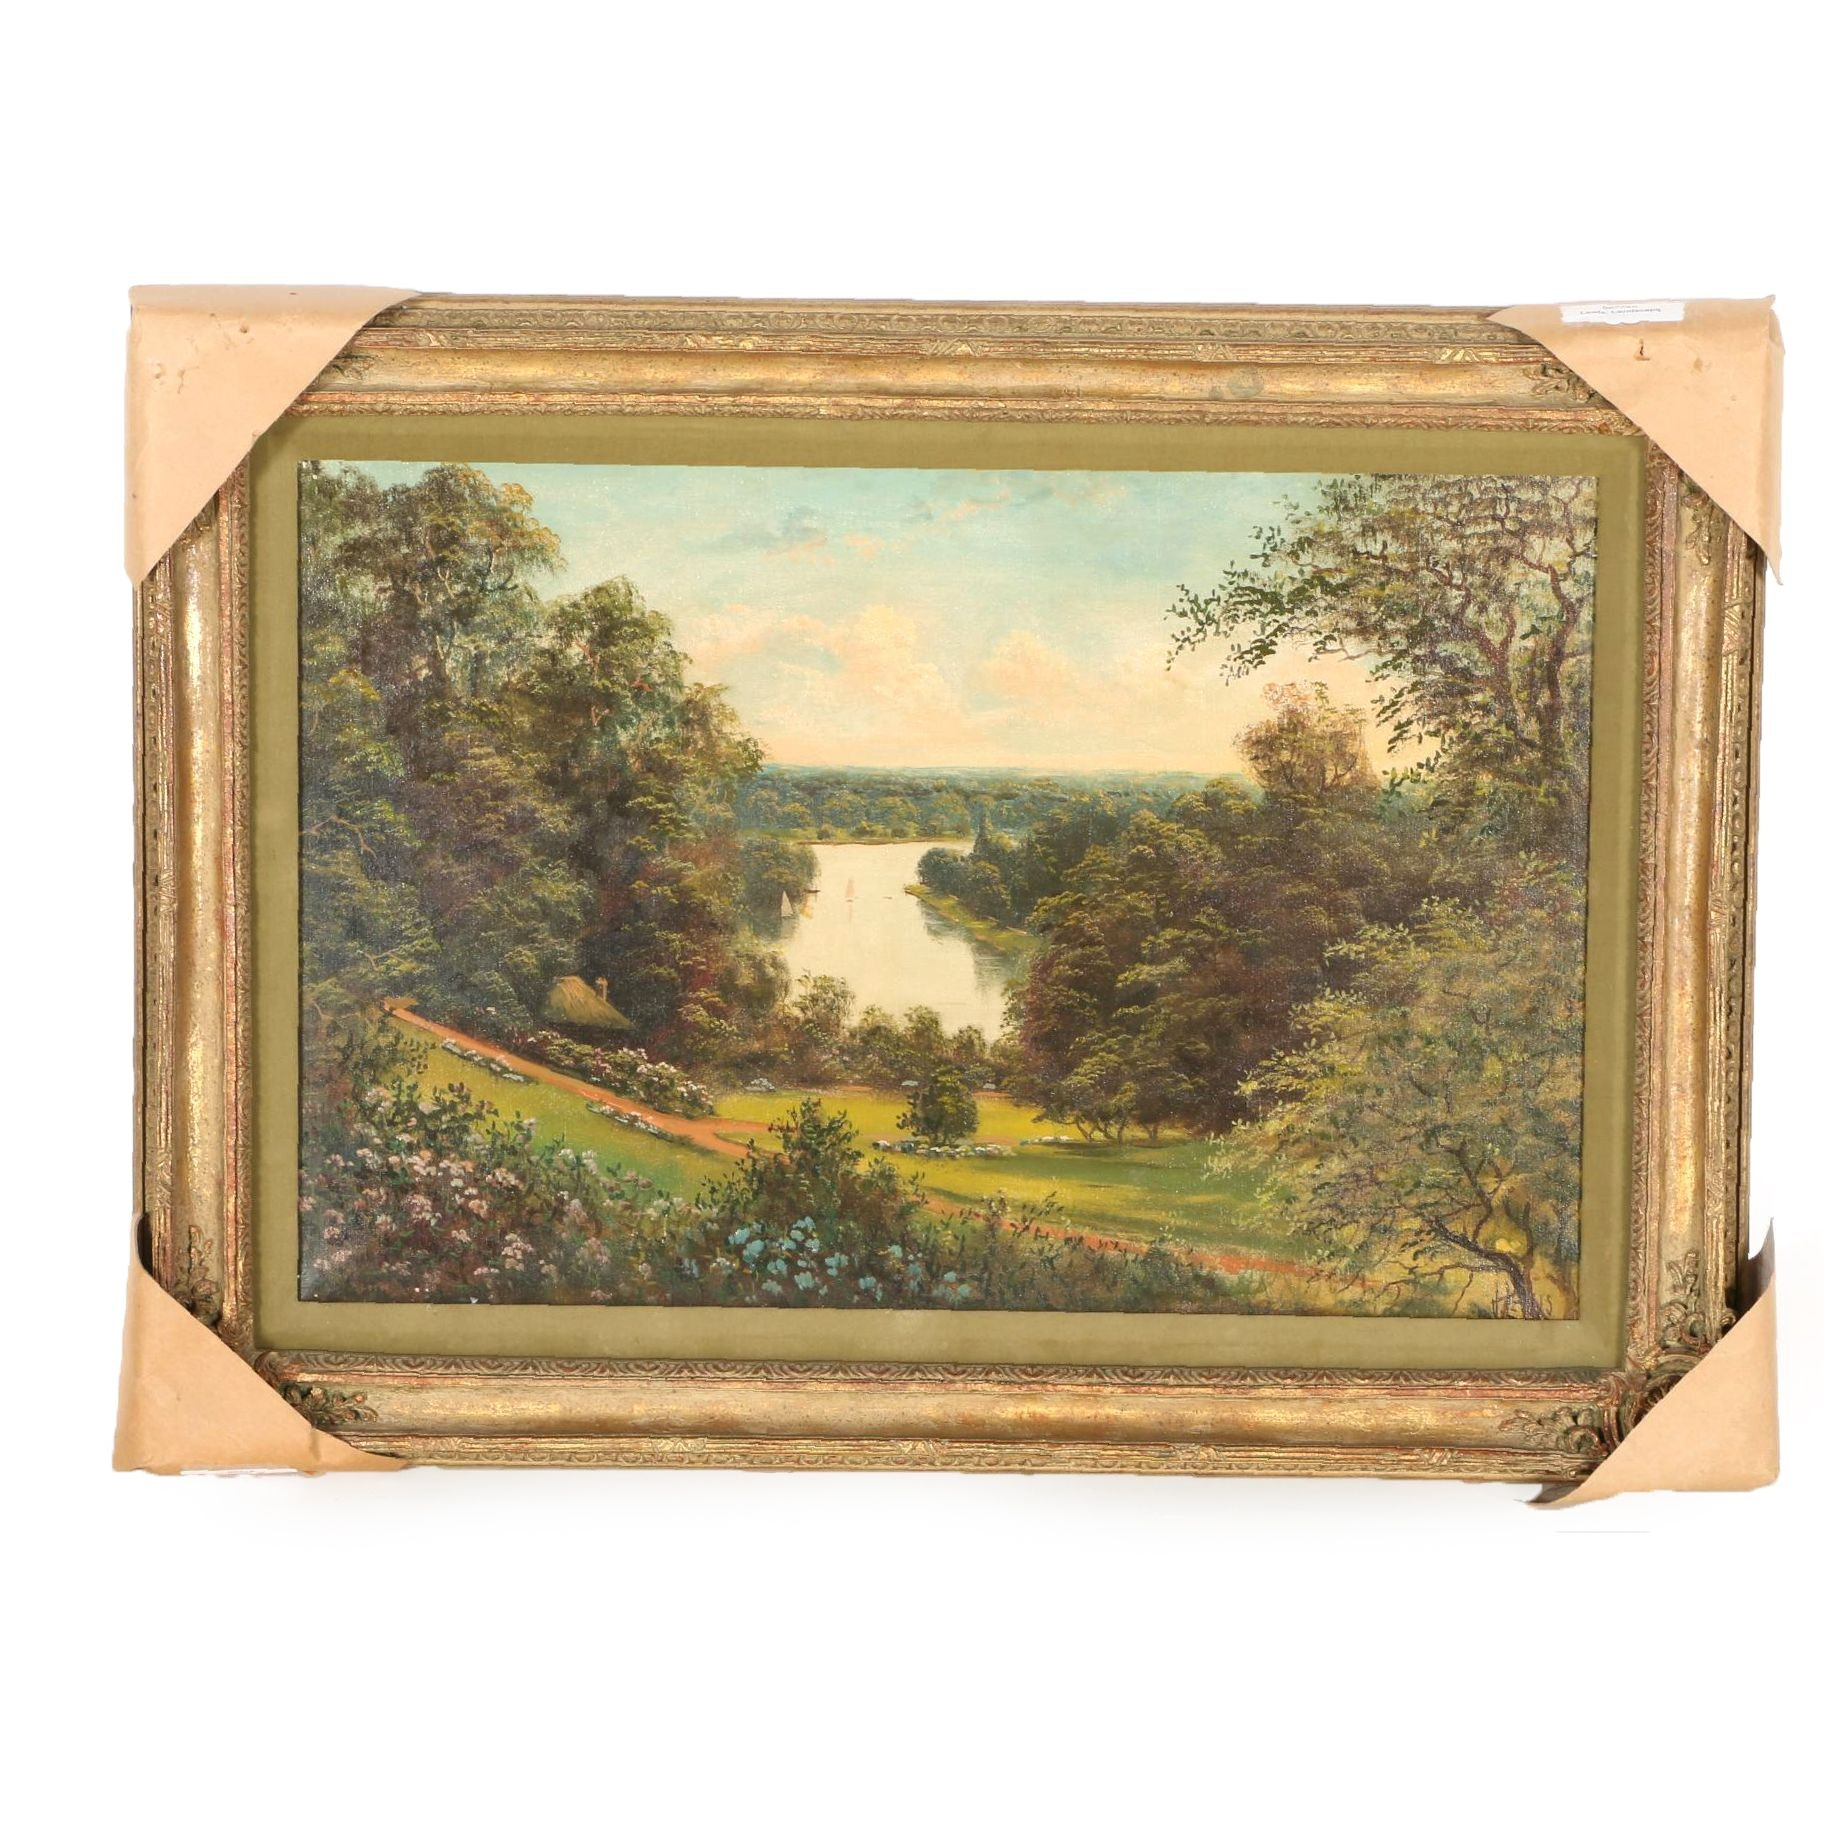 John Lewis Oil Painting on Canvas Landscape